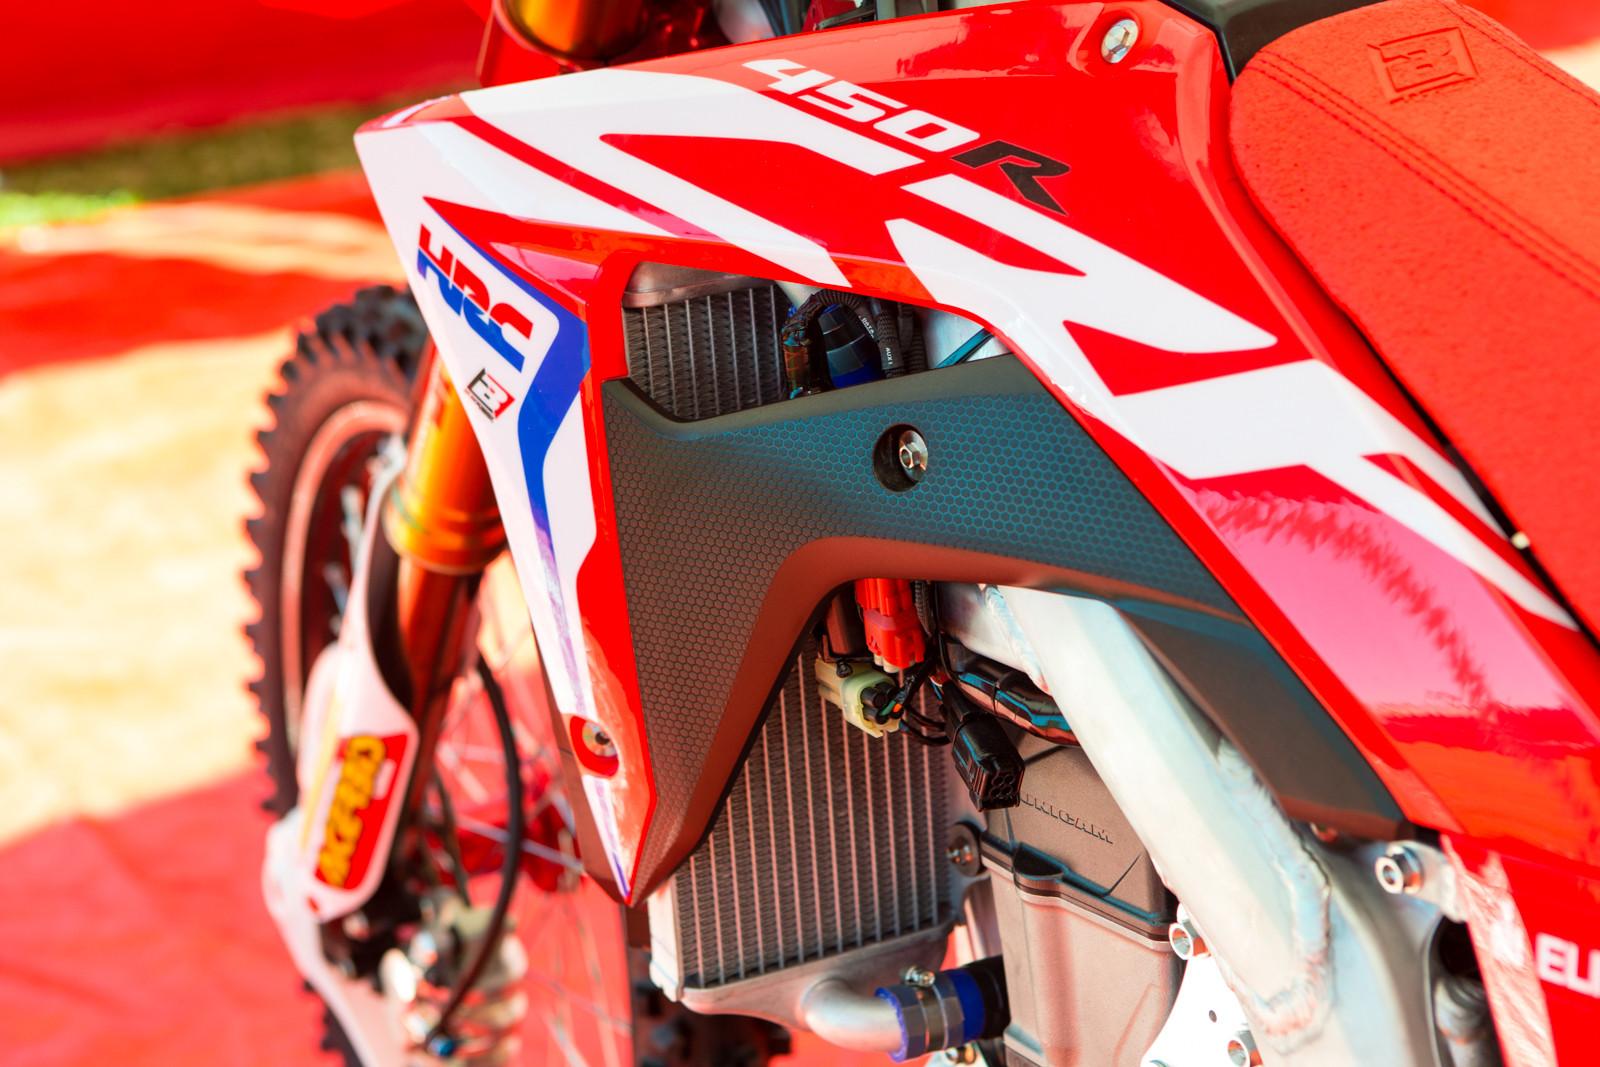 Production vs Pre-Production - Vital MX Pit Bits: 2016 Monster Energy Cup - Motocross Pictures - Vital MX